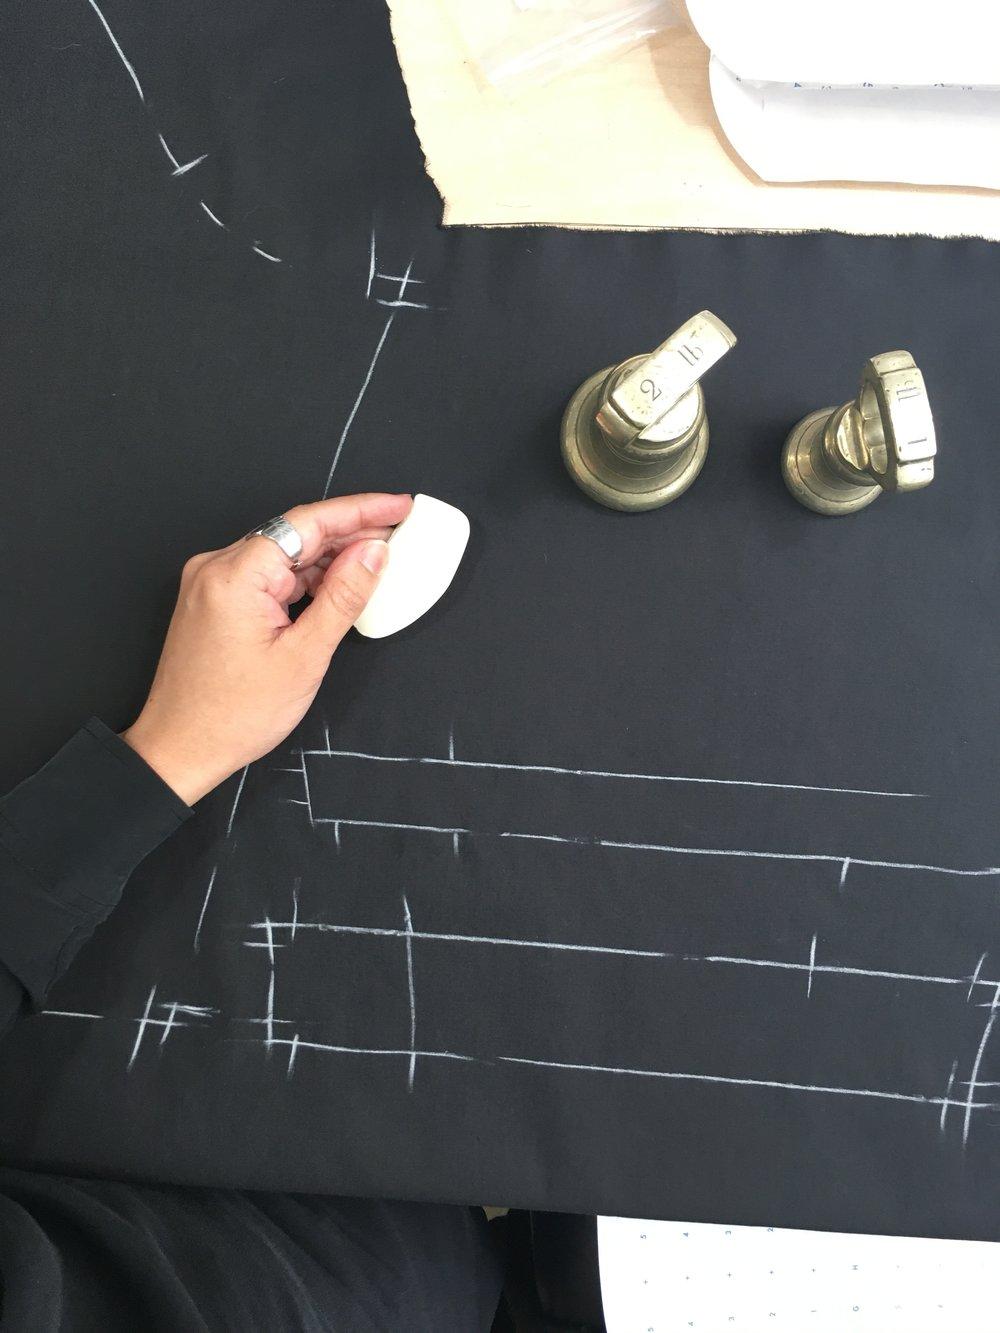 #Patternmaking #design #designer #technicaldesign #muslin #nicolemelendez